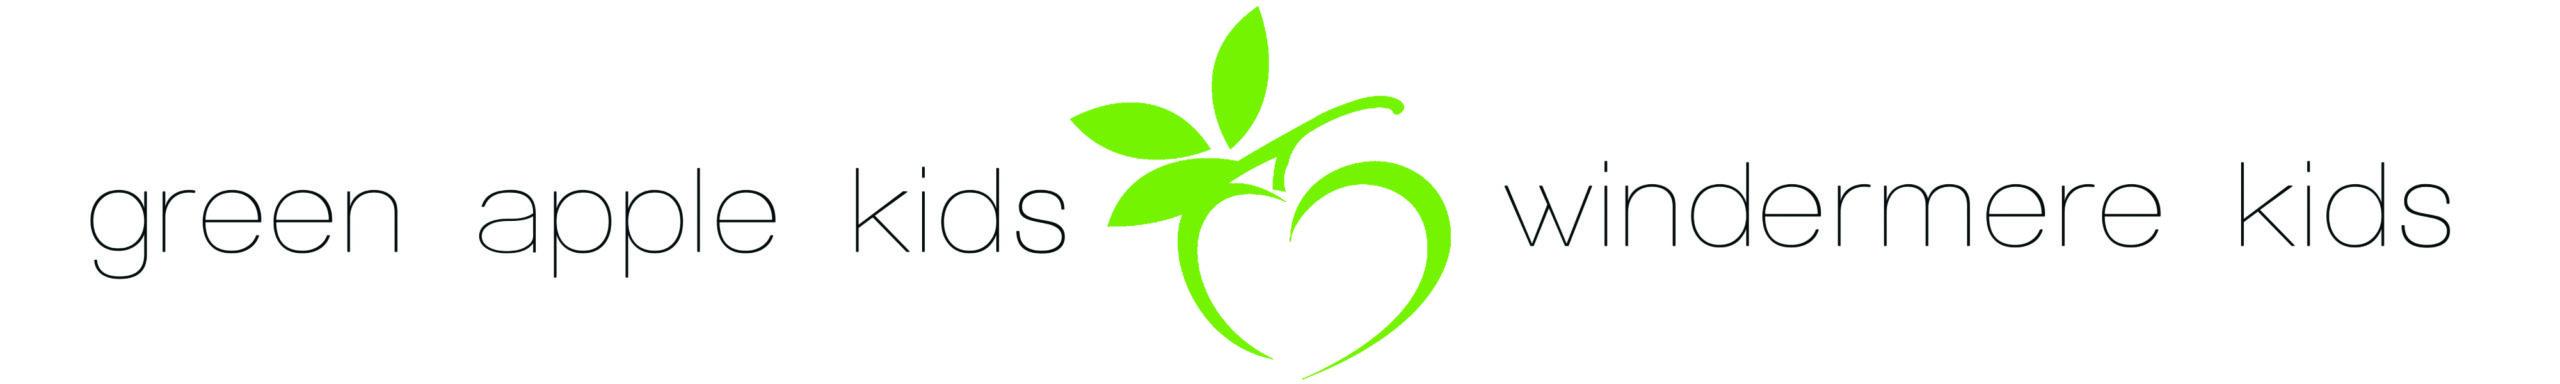 Green Apple Kids - Windermere Kids